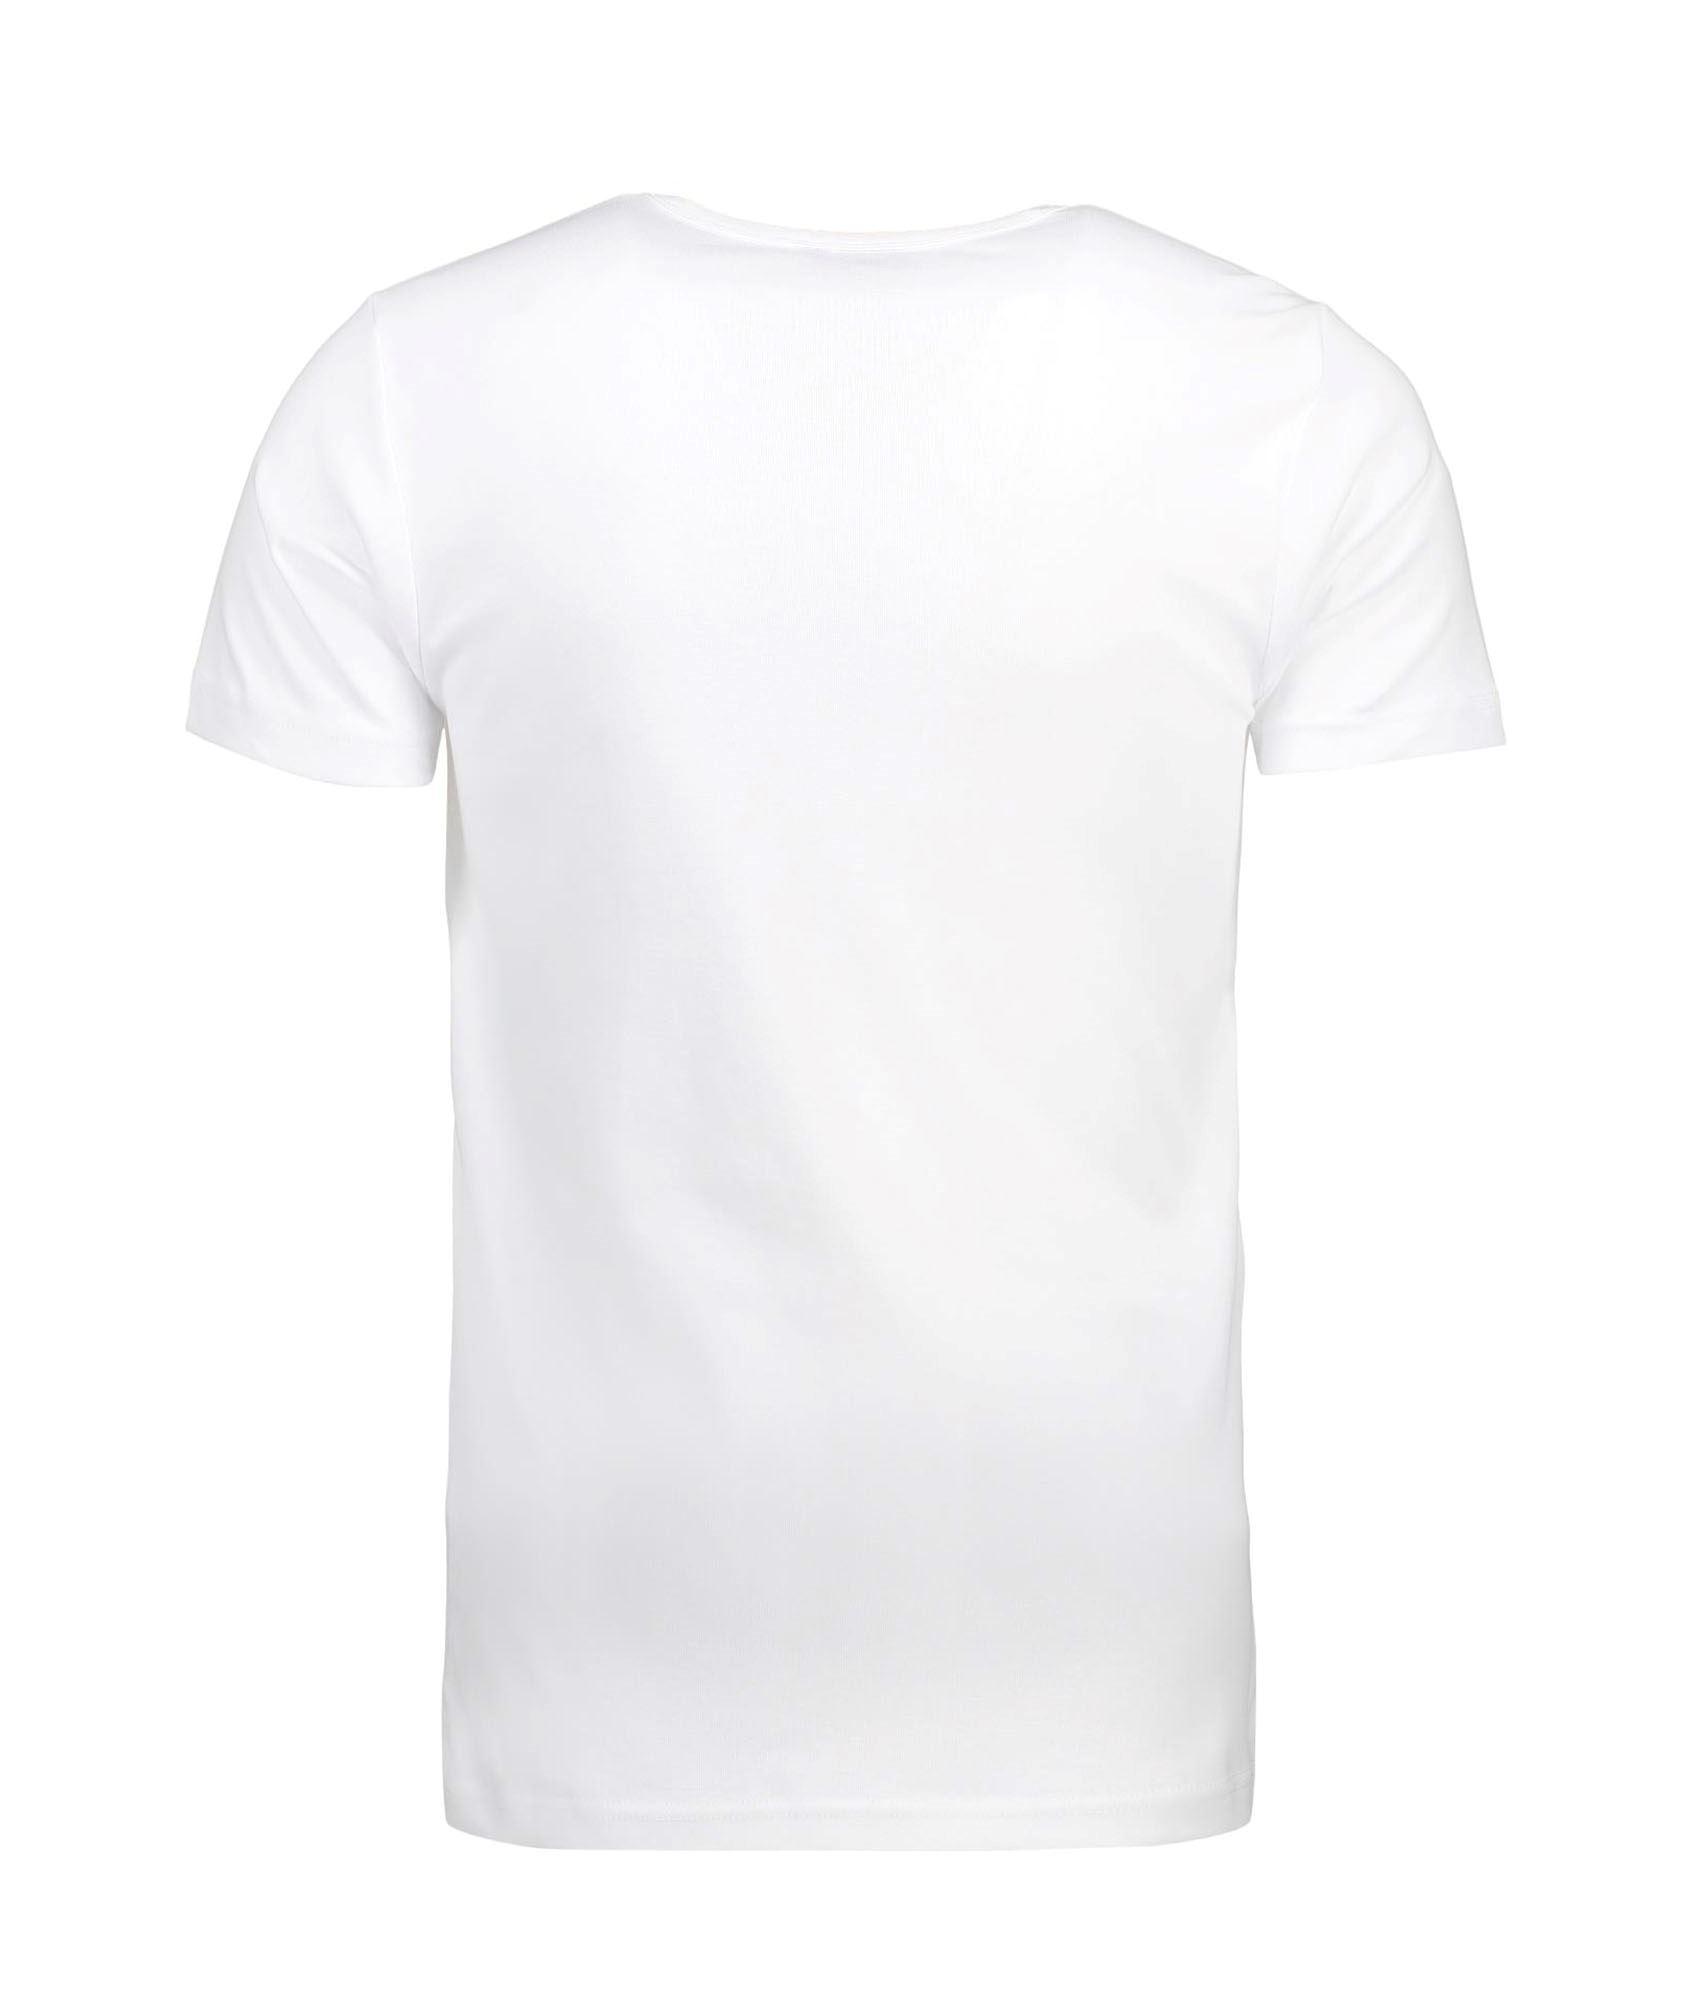 ID Rib herre t shirt, hvid